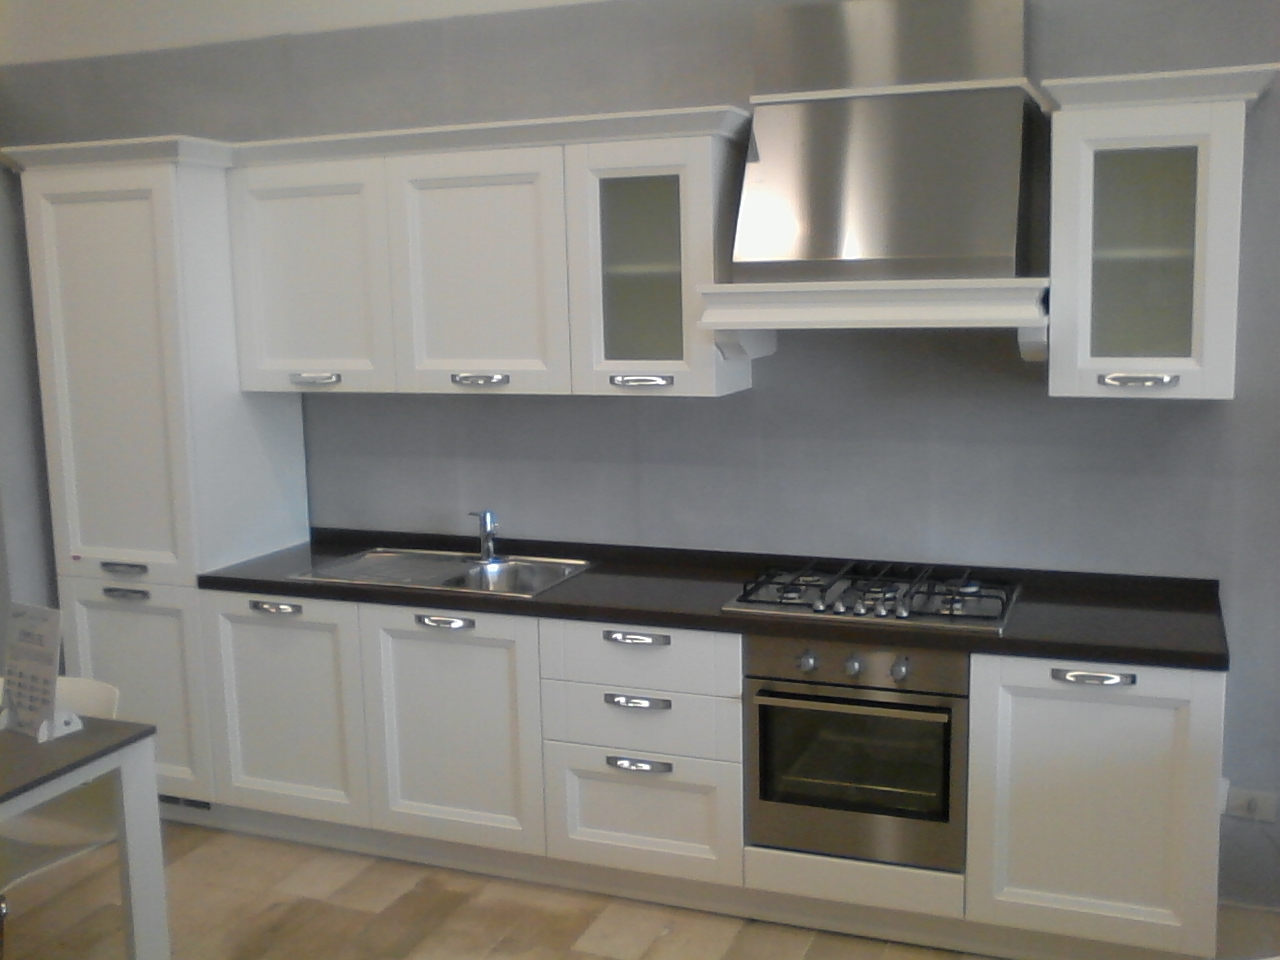 Vismap cucina giulia frassino laccato bianco classica - Cucina classica bianca ...